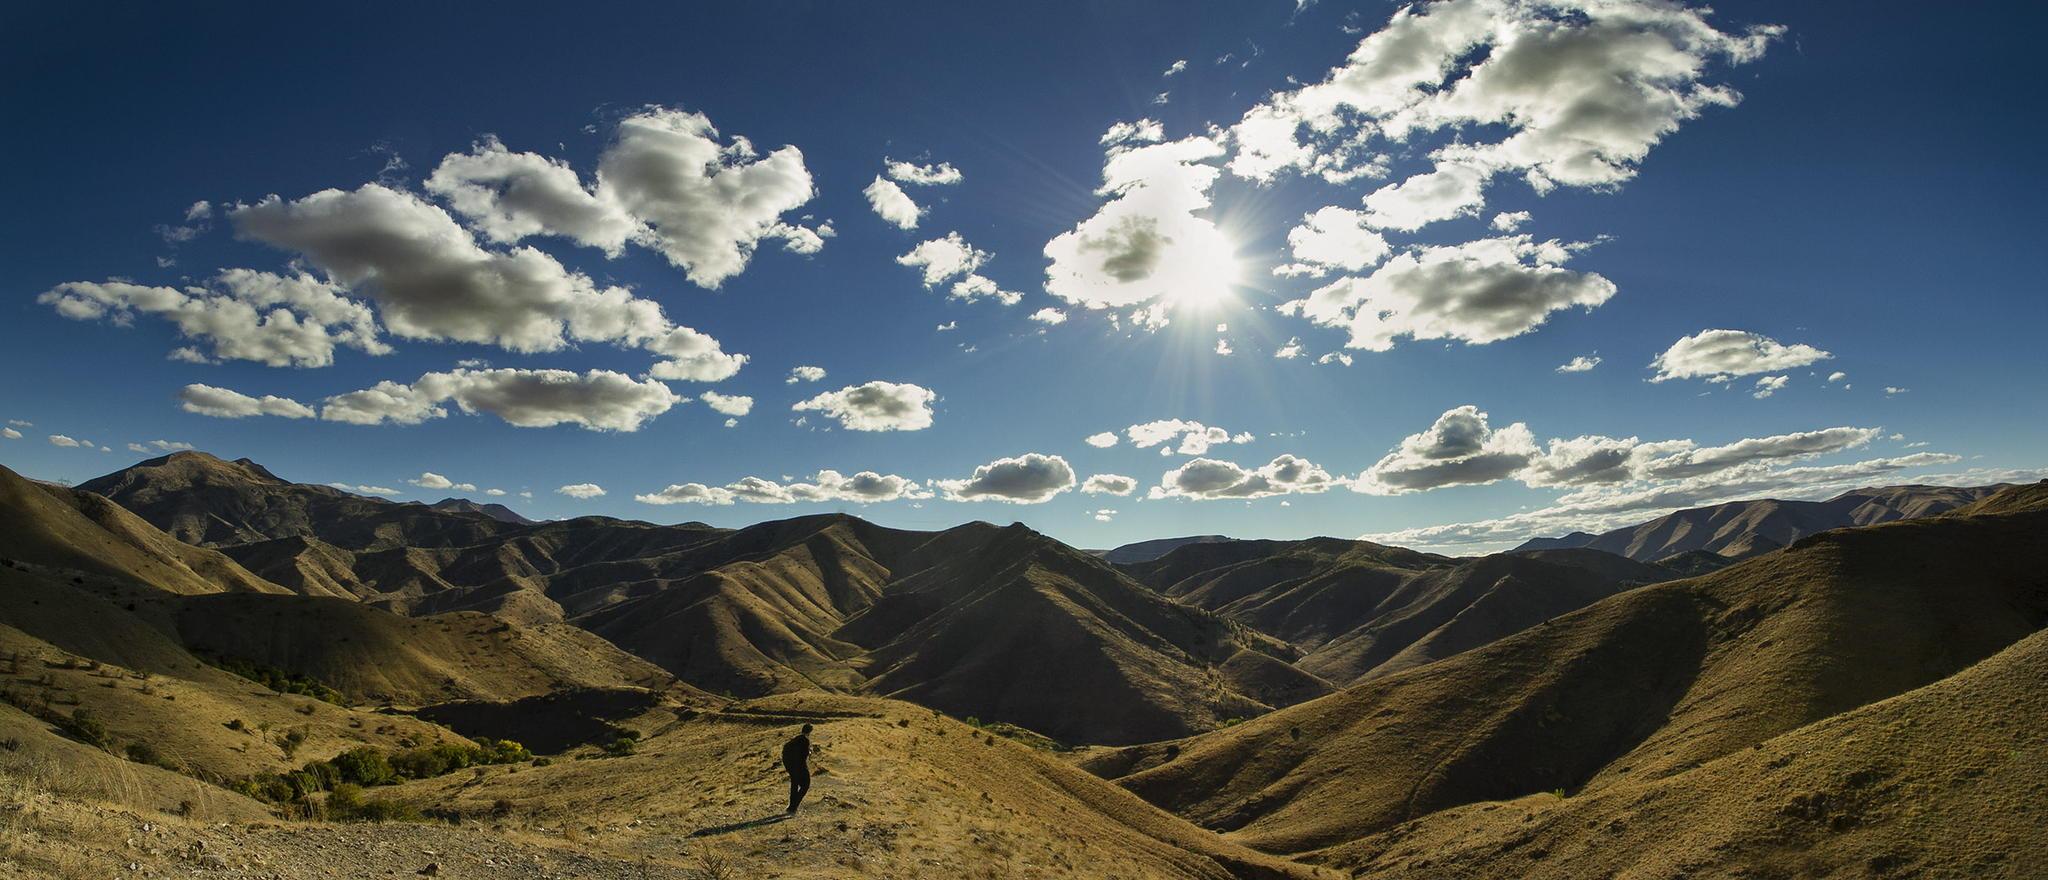 Trekking in Turkey. Photo Credit: Engin Asil